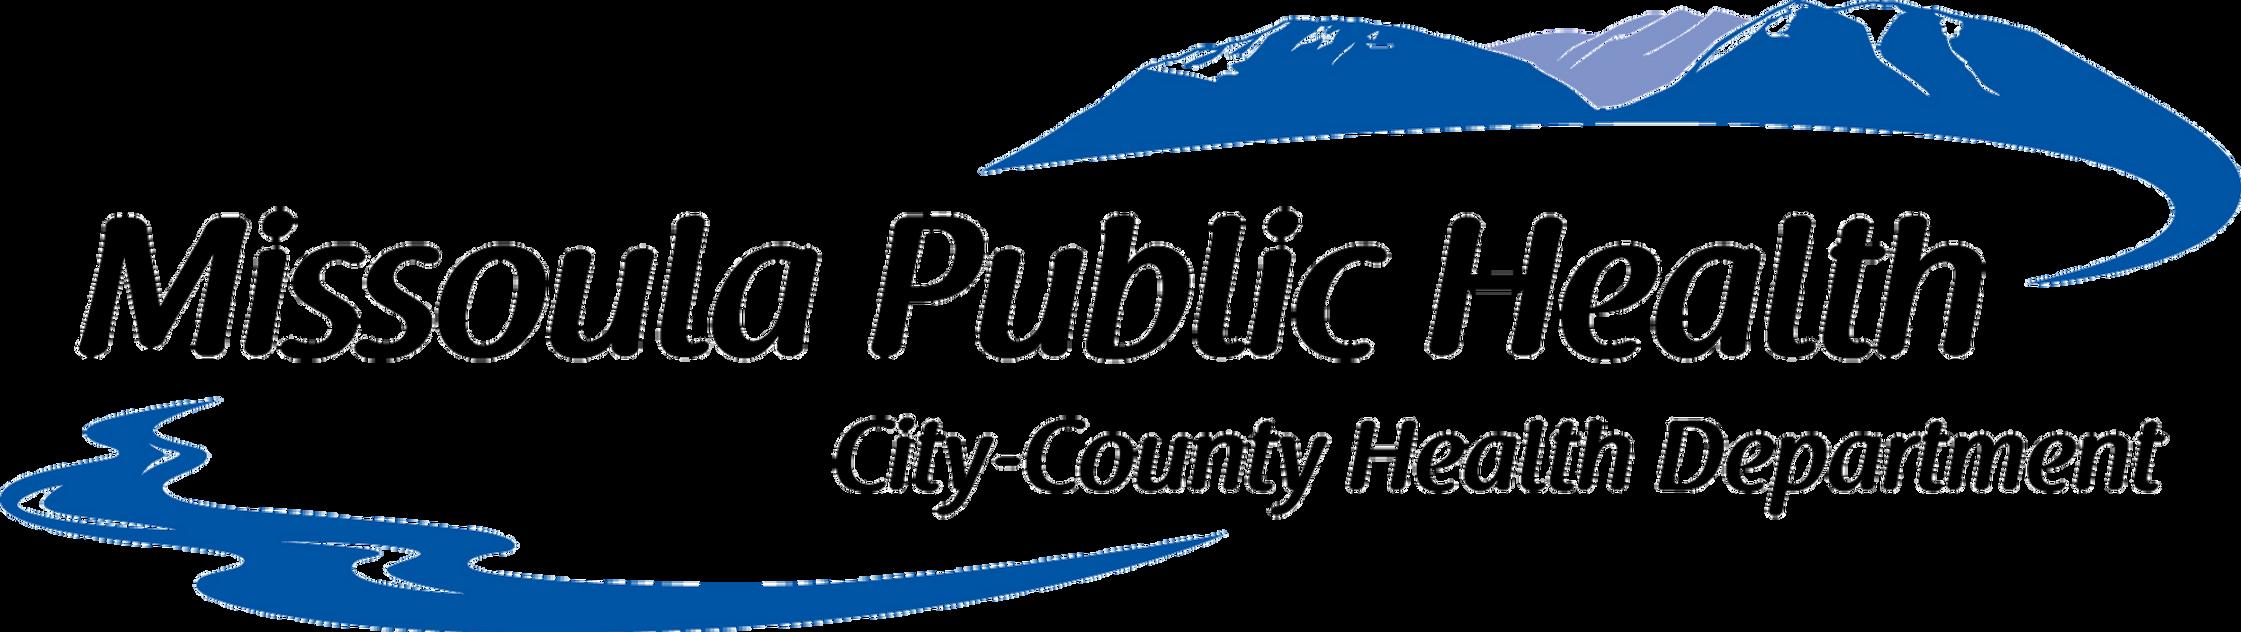 Missoula City-County Health Department